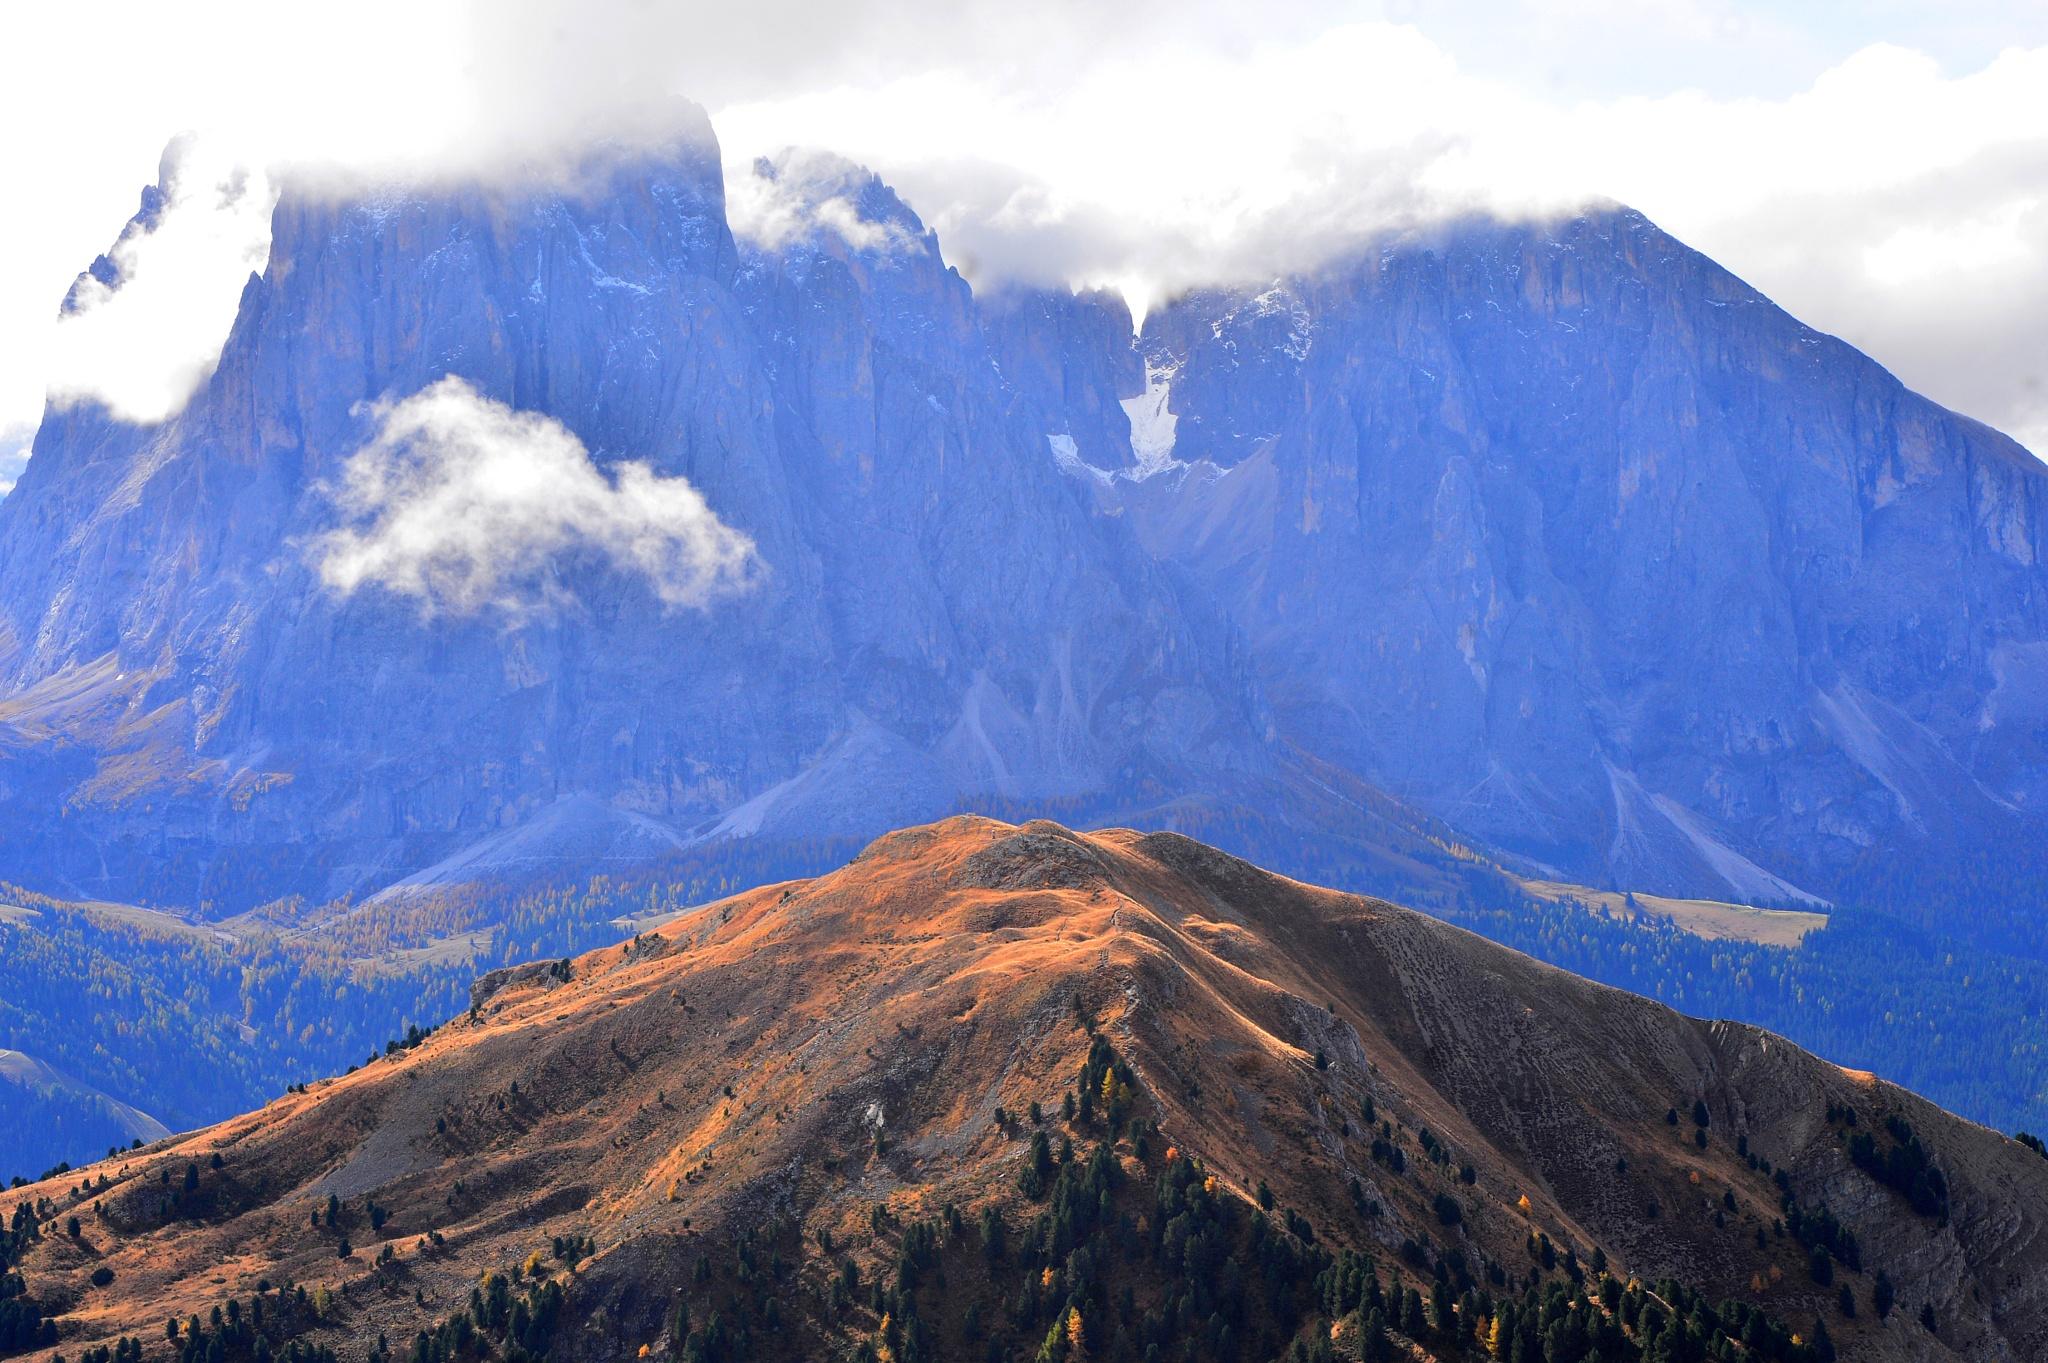 picgerg-hill by maurizio senoner